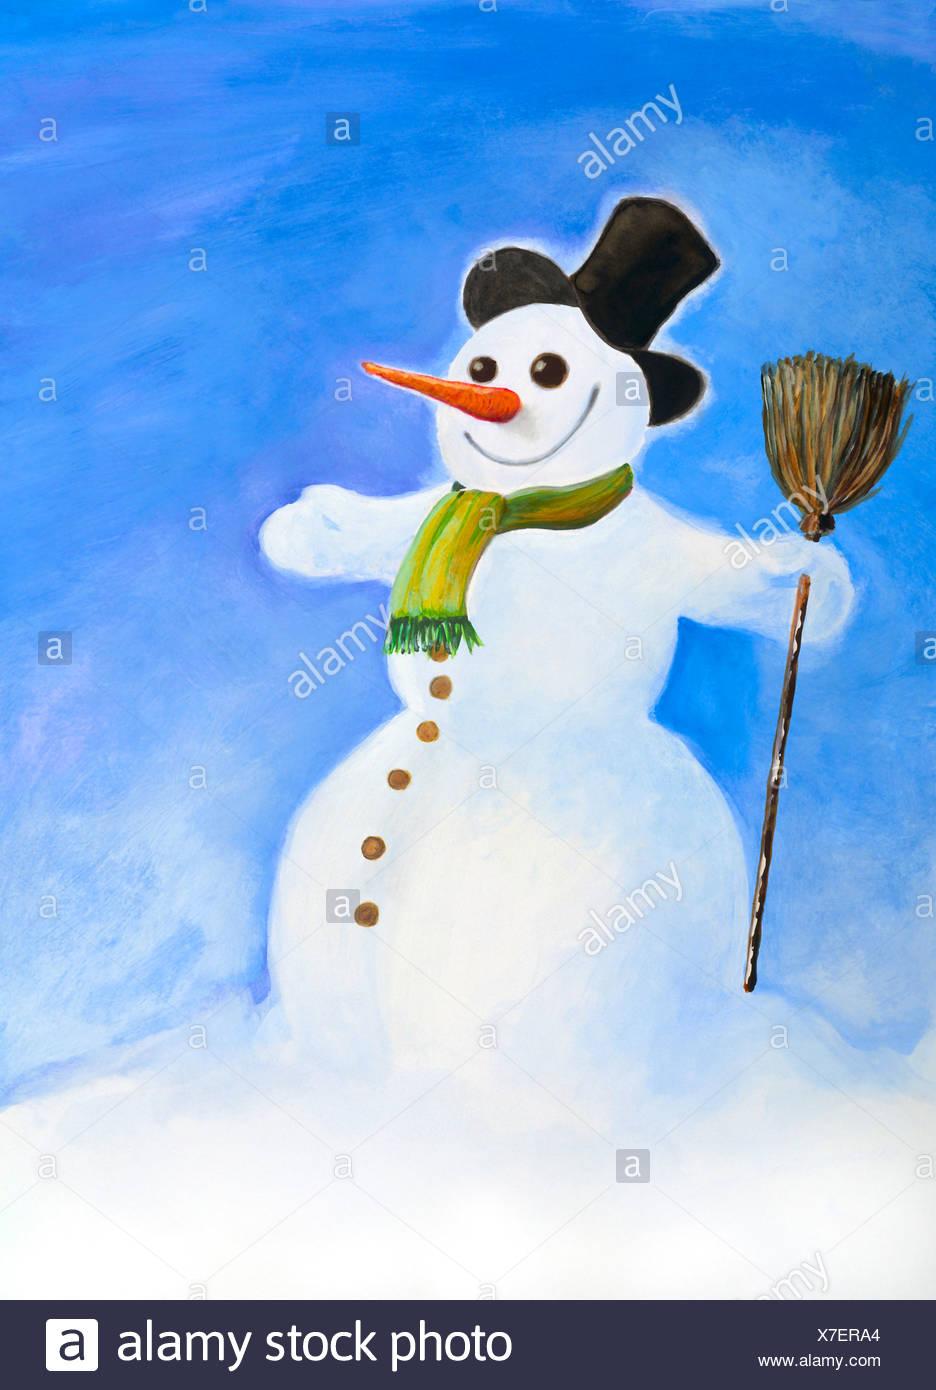 Le Snowman, illustration Photo Stock